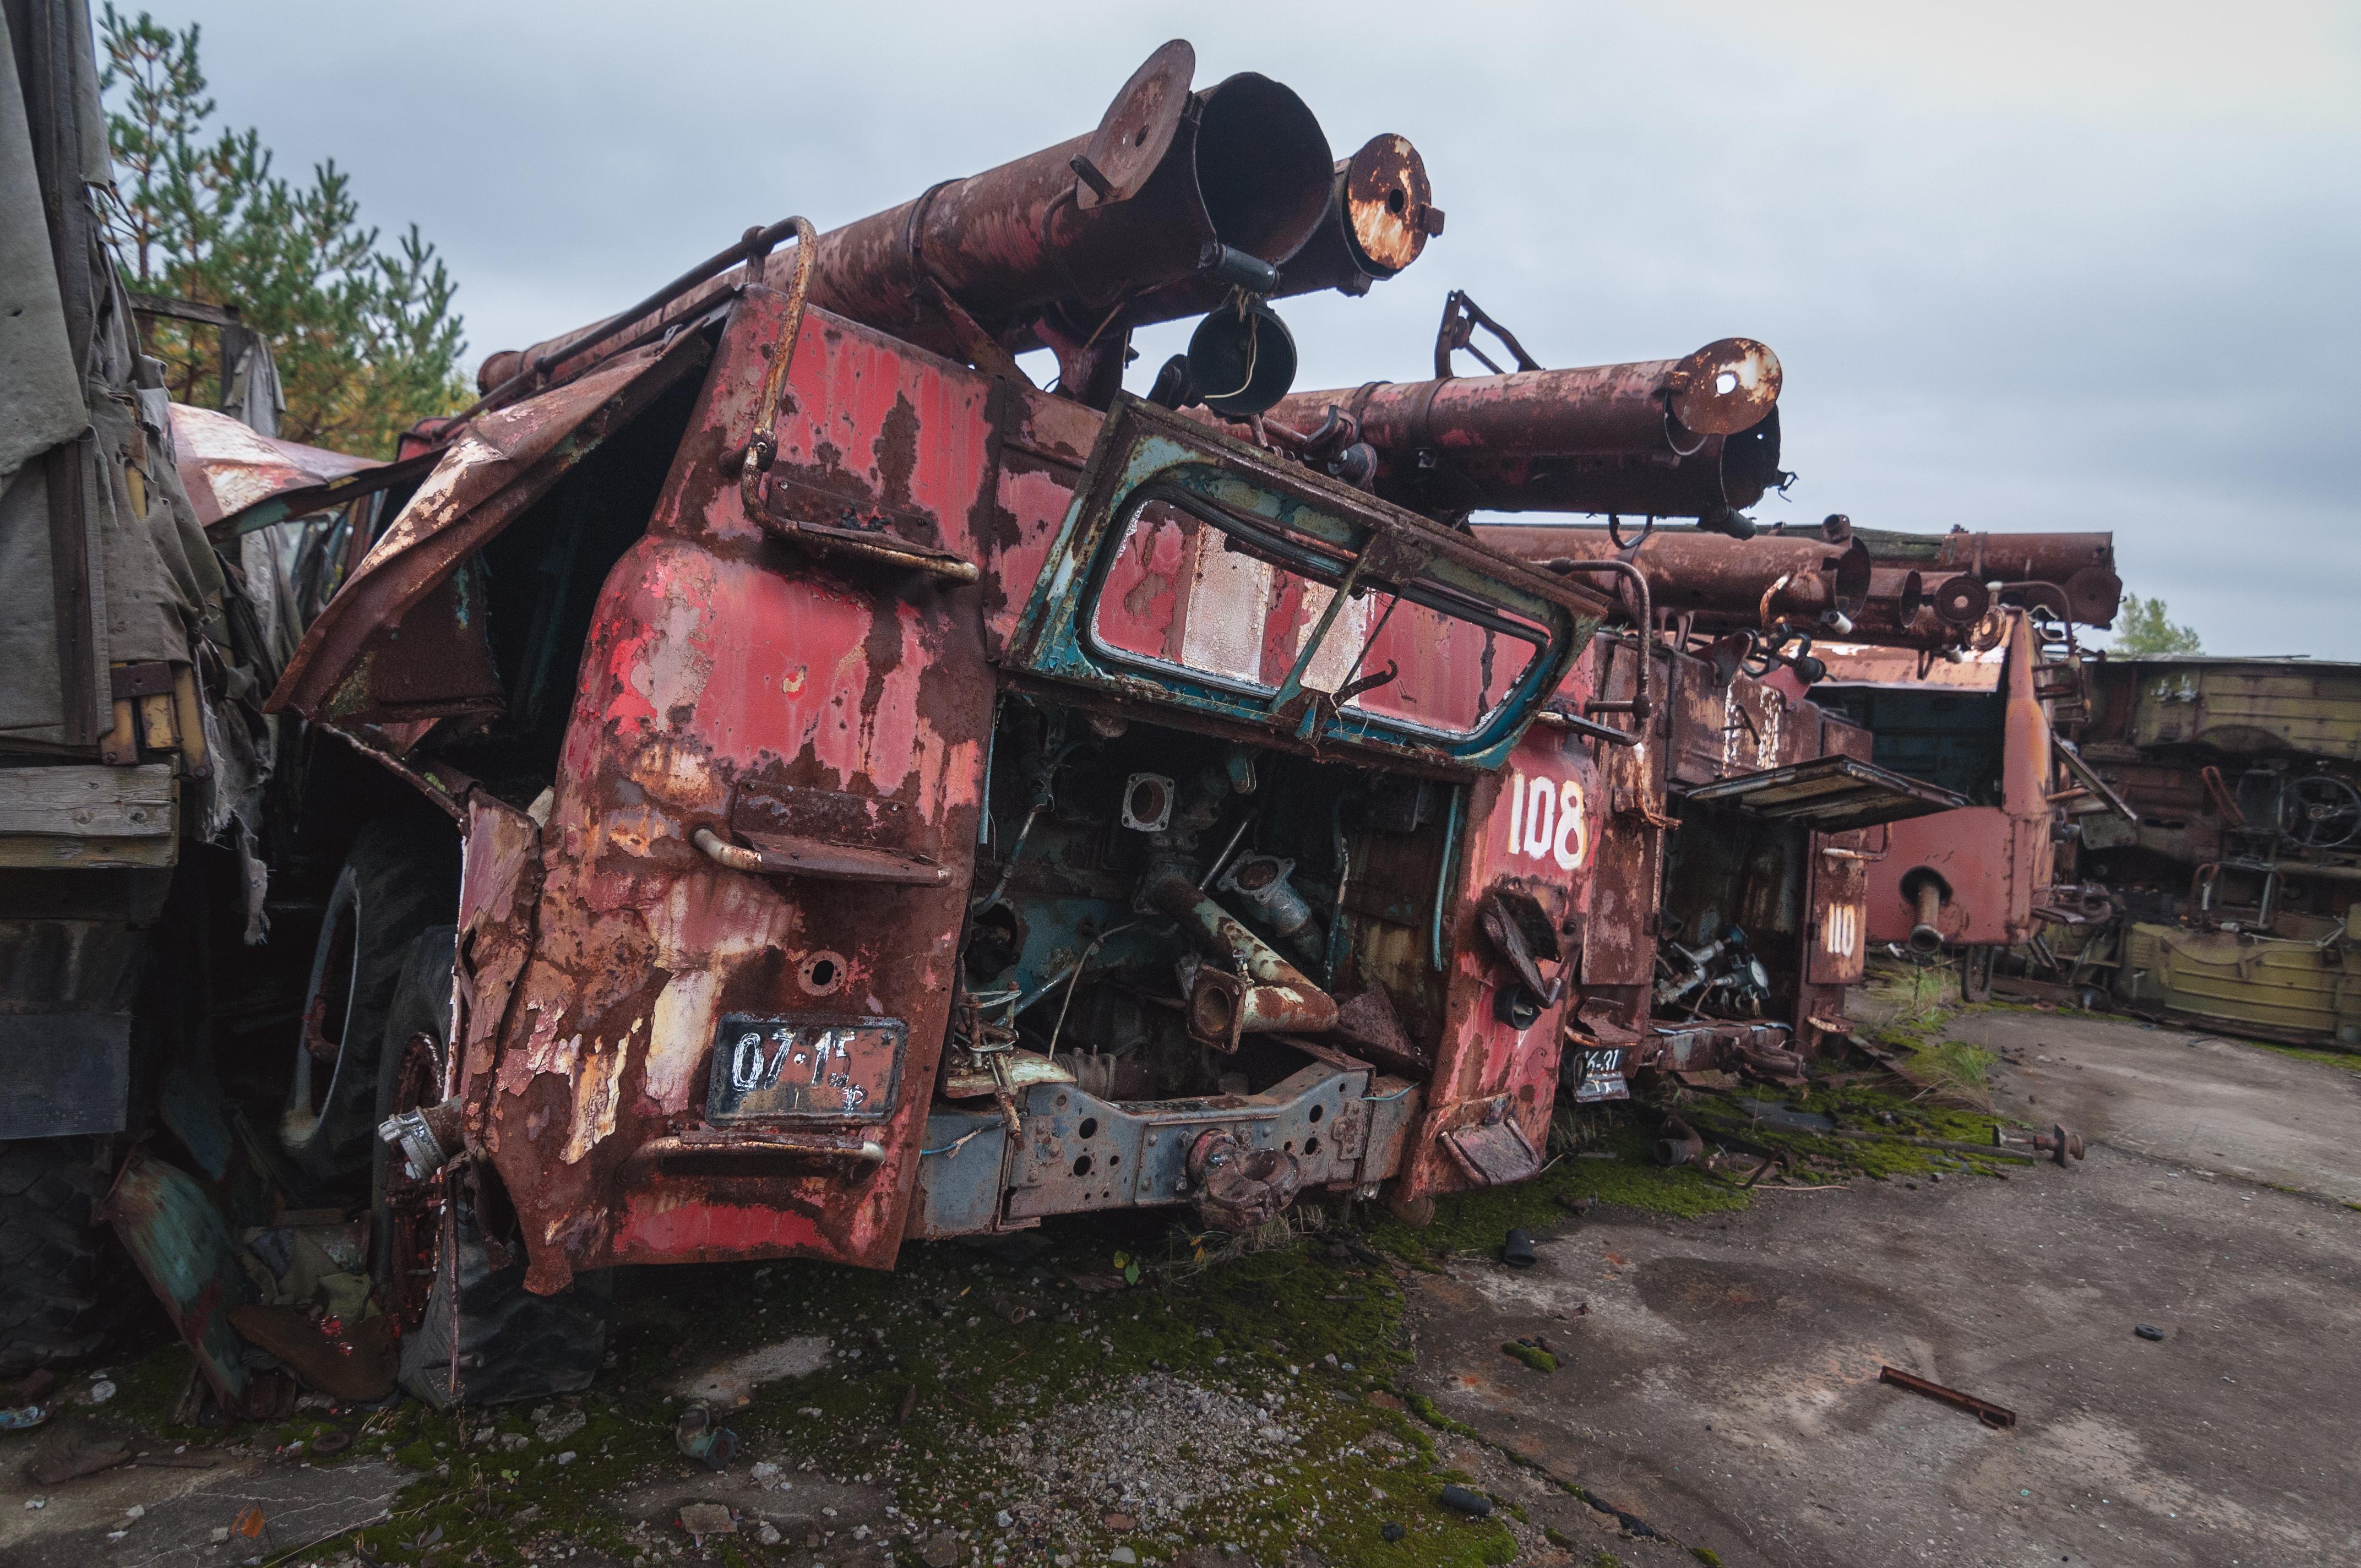 Chernobyl by Andrew Leatherbarrow - Exposure